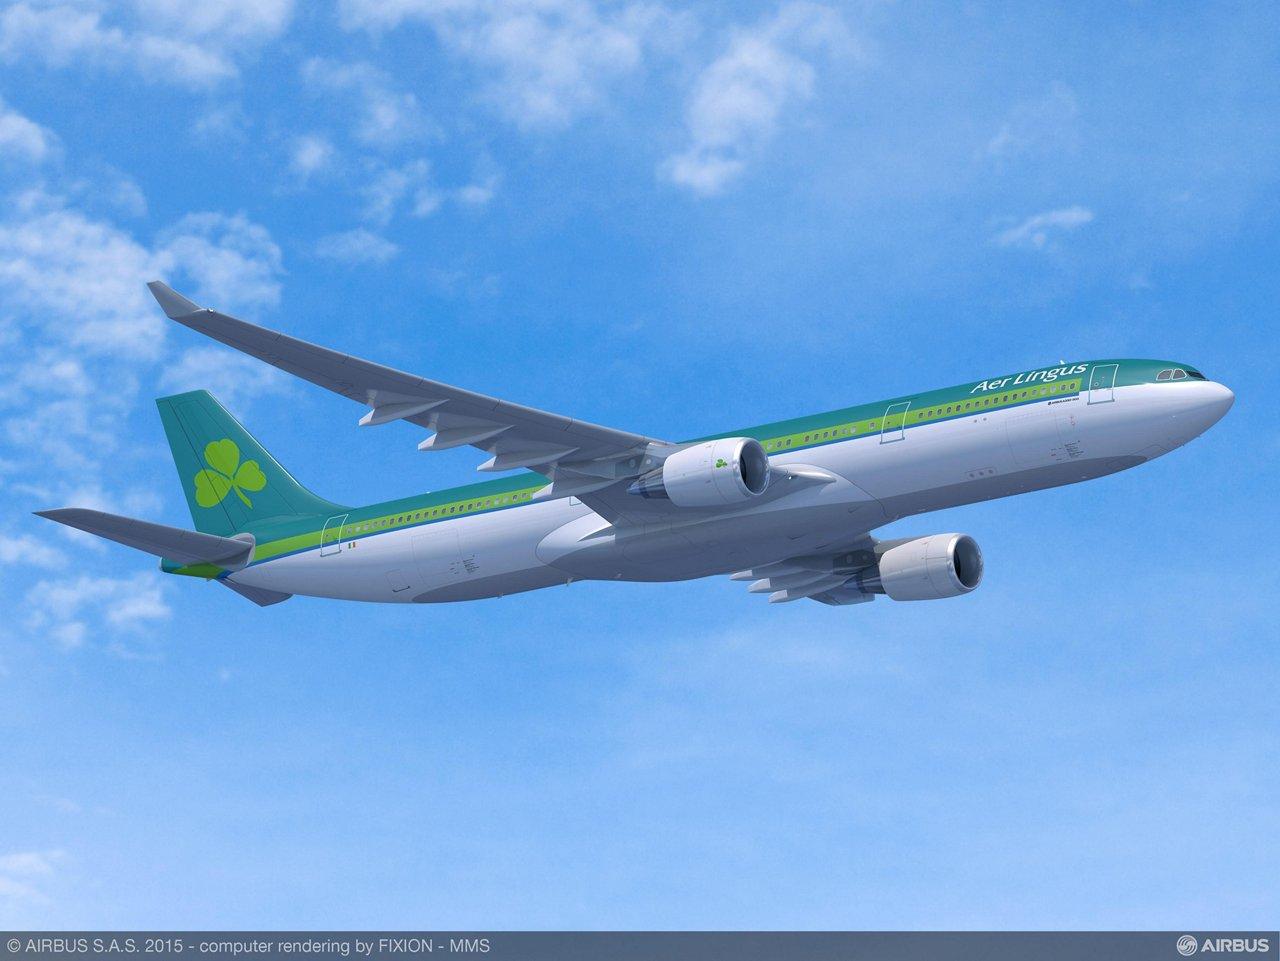 A330-300_Aer Lingus